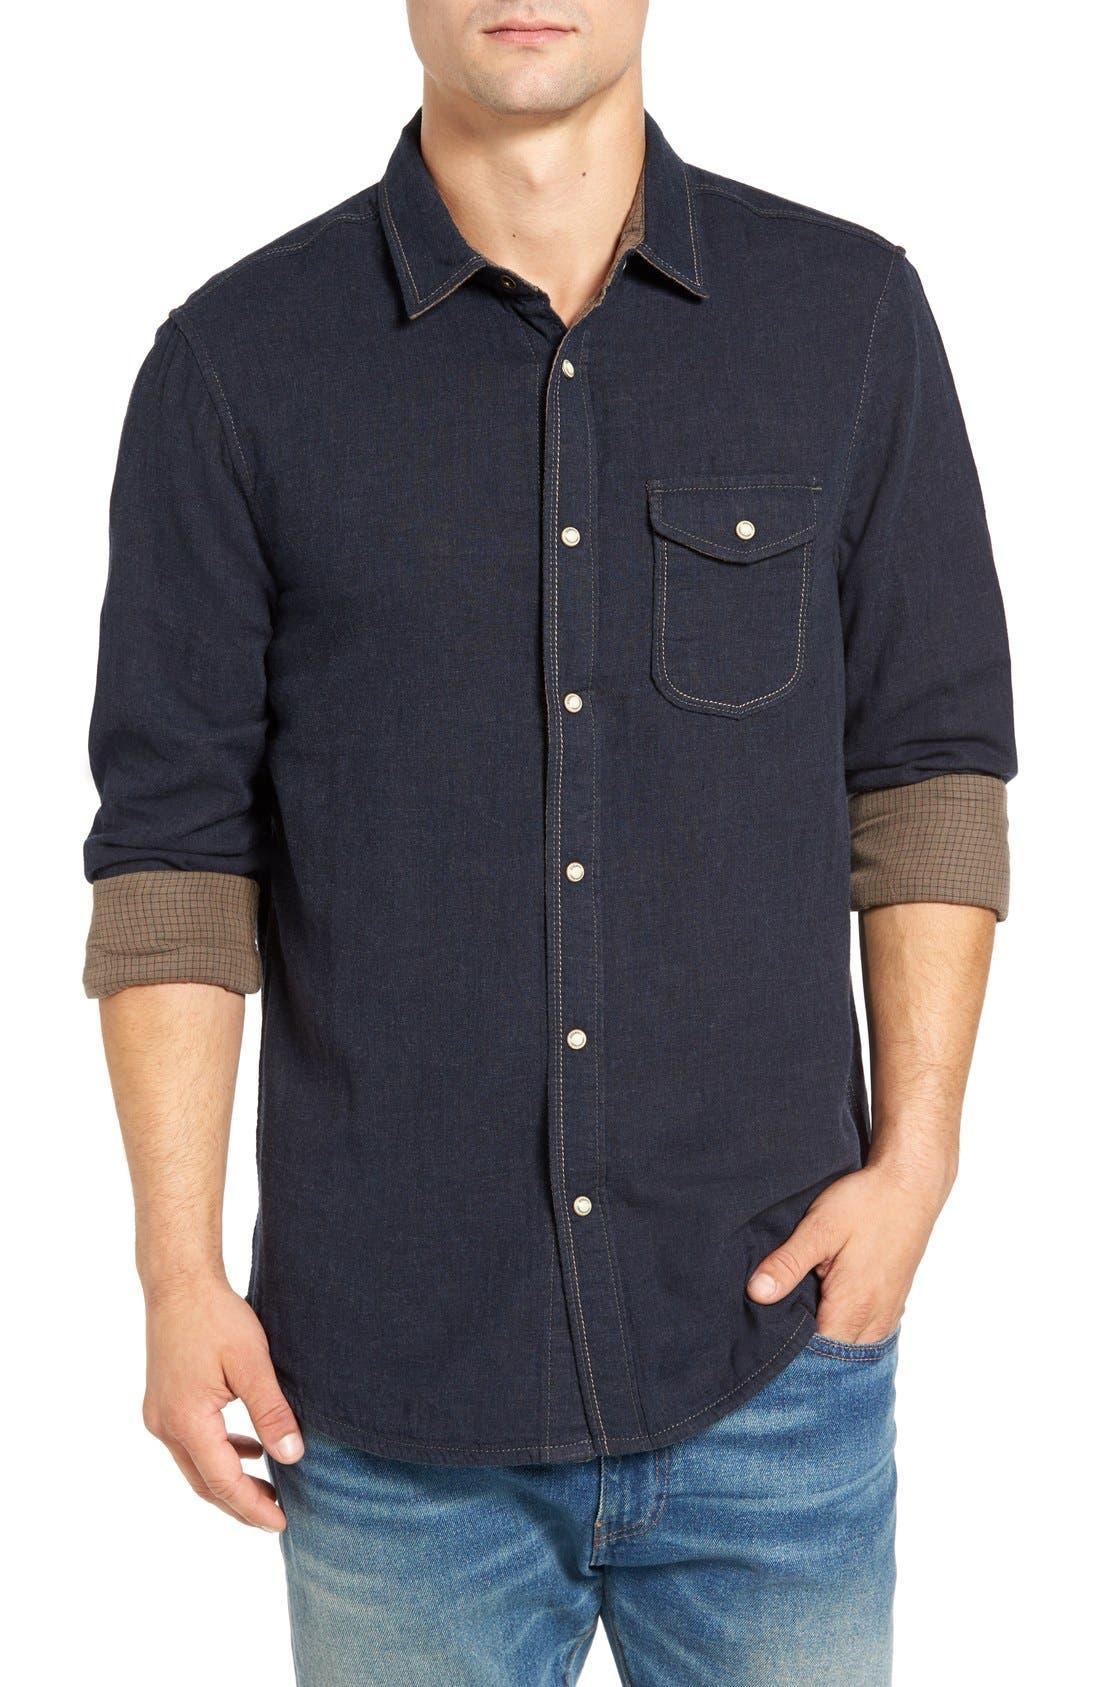 Jeremiah Chase Mélange Sport Shirt